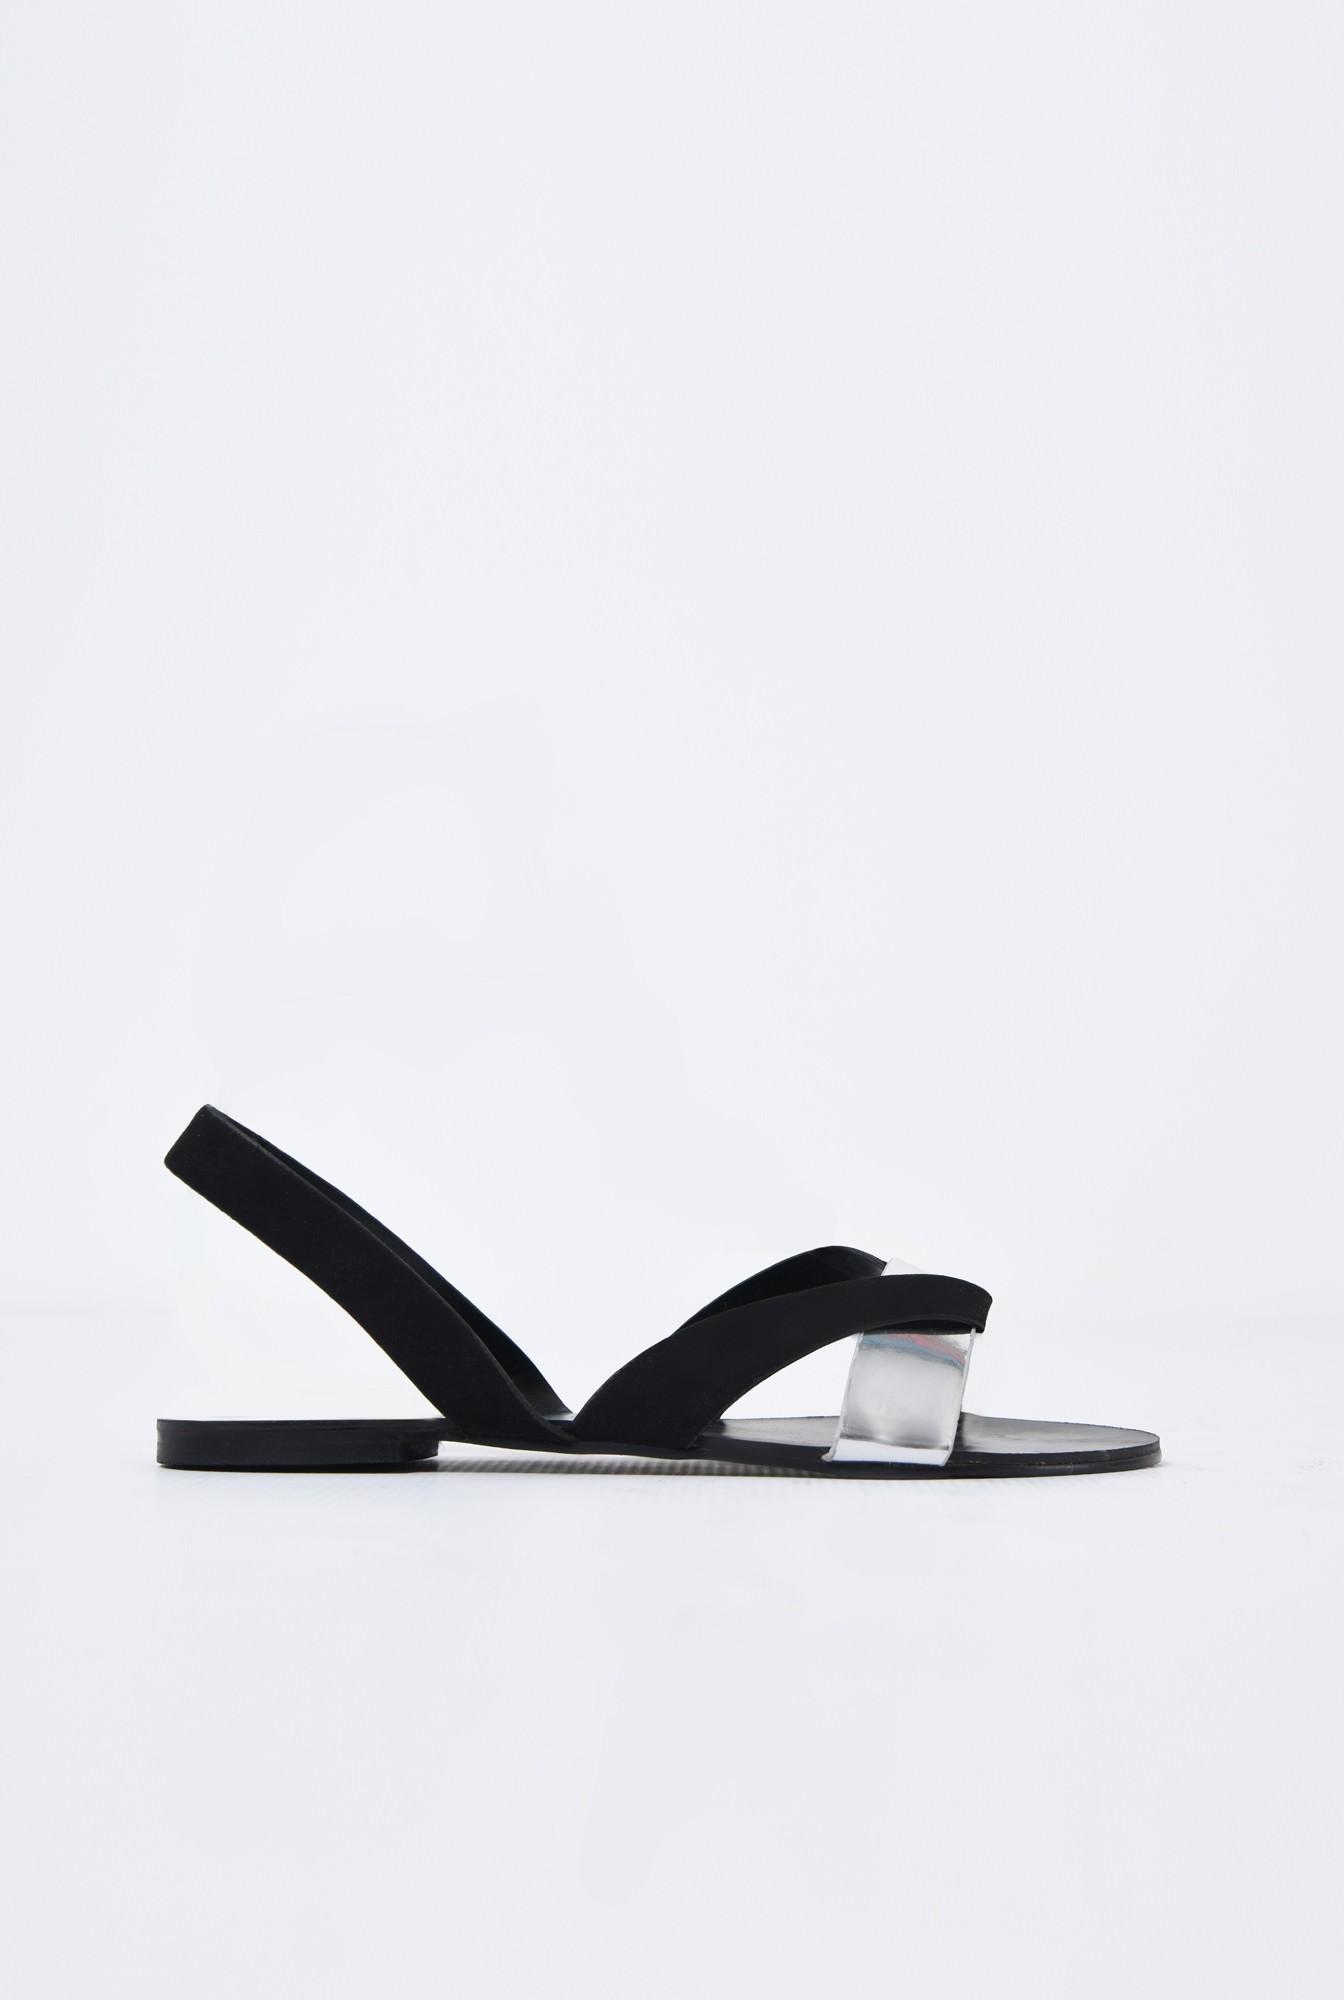 sandale comode, velur, bareta argintie, talpa joasa